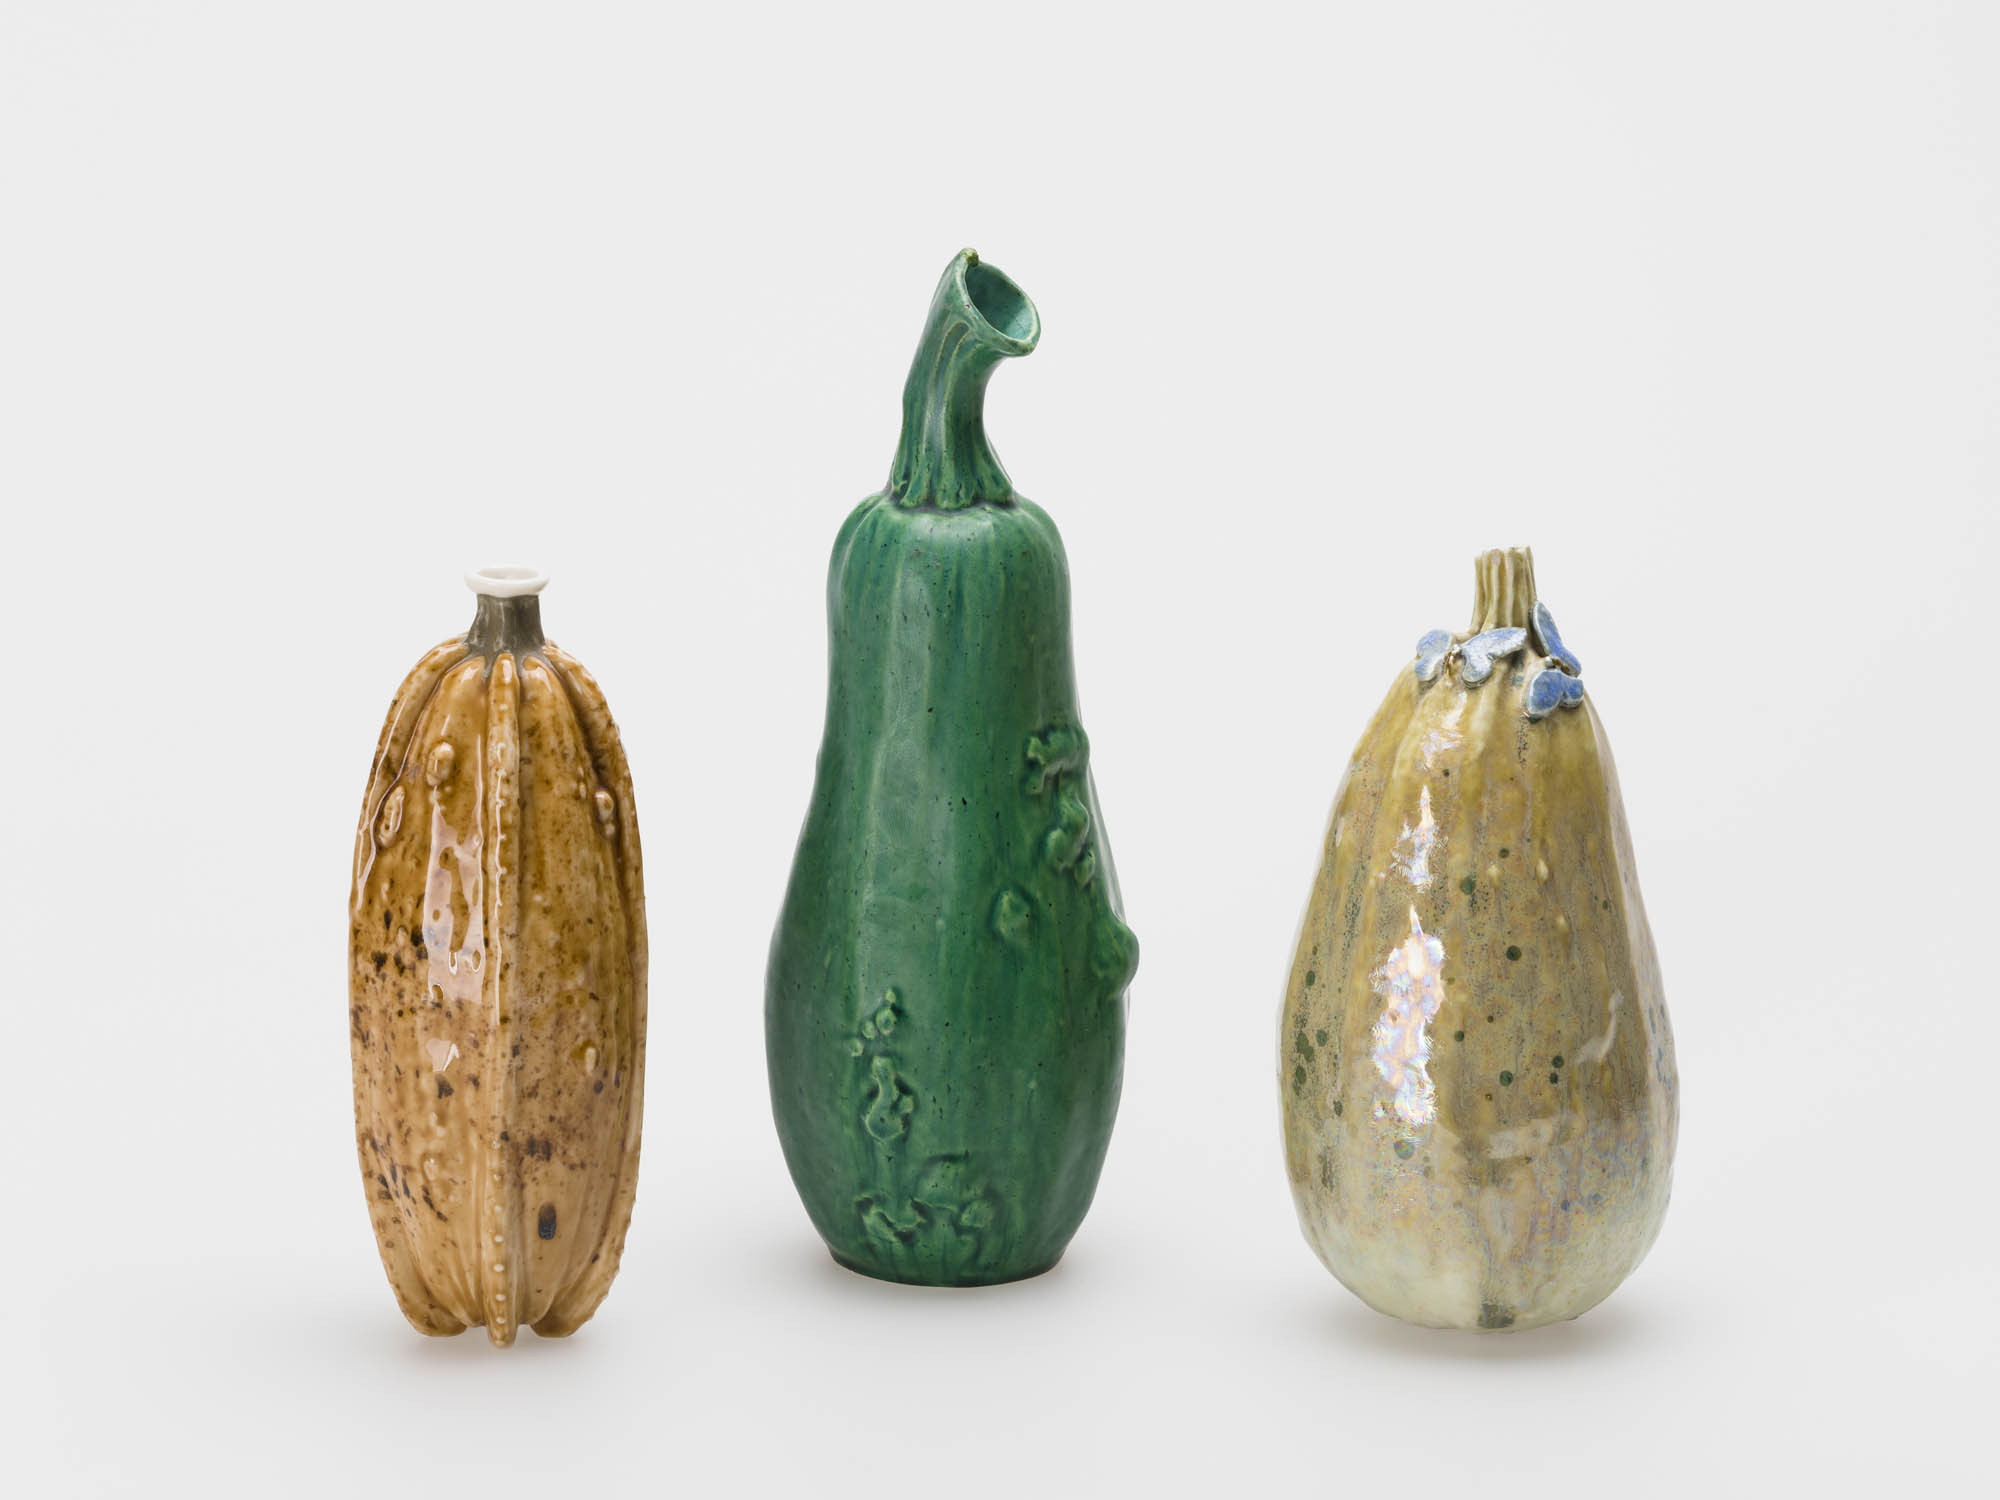 Kürbis Taxile Doat Vase